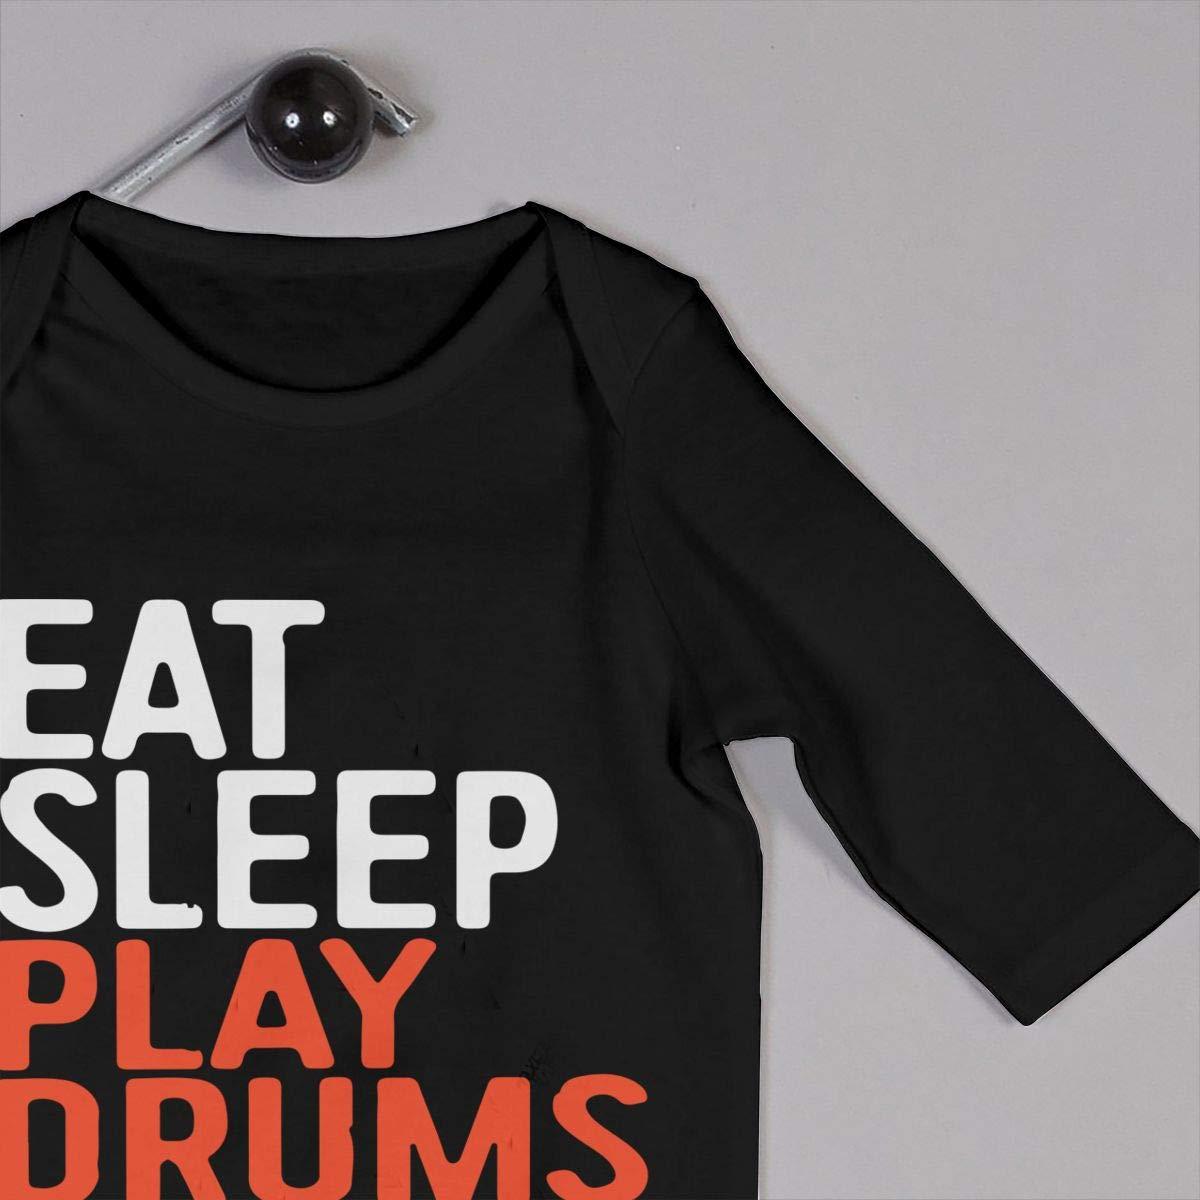 UGFGF-S3 Eat Sleep Play Drums Repeat Toddler Baby Long Sleeve Romper Jumpsuit Infant Romper Jumpsuit